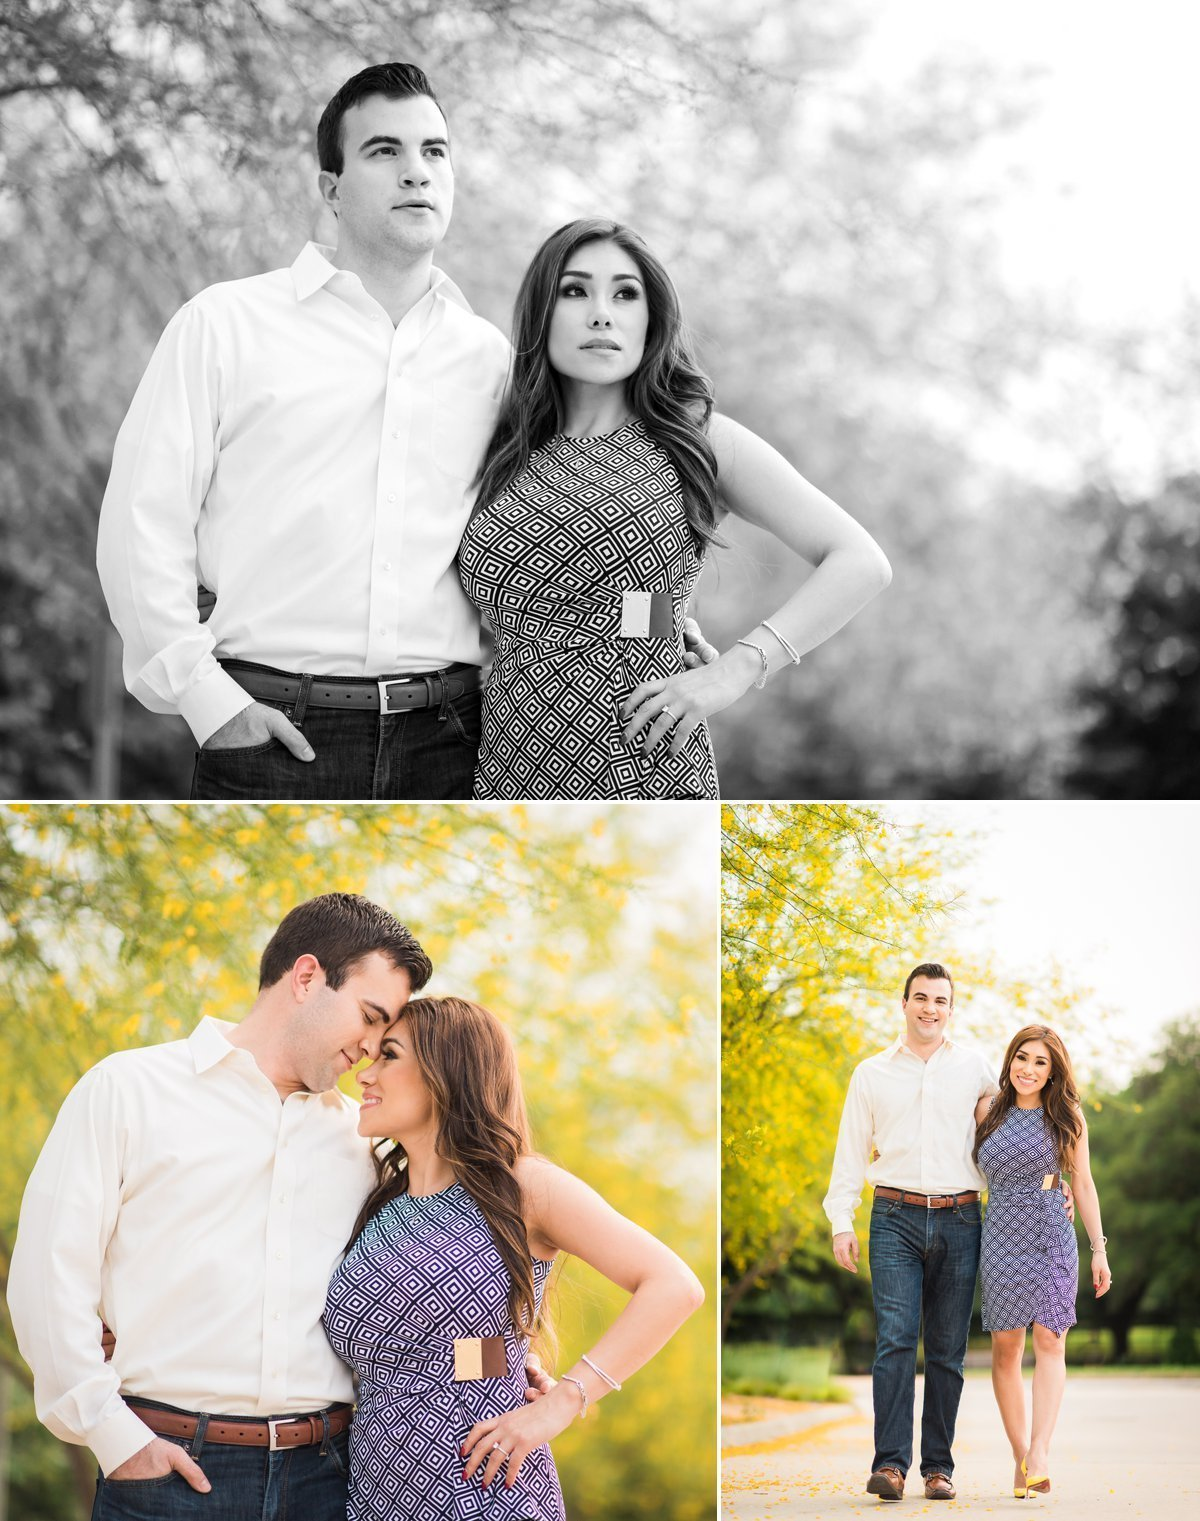 Brenda & Marco Engagement Blog 8